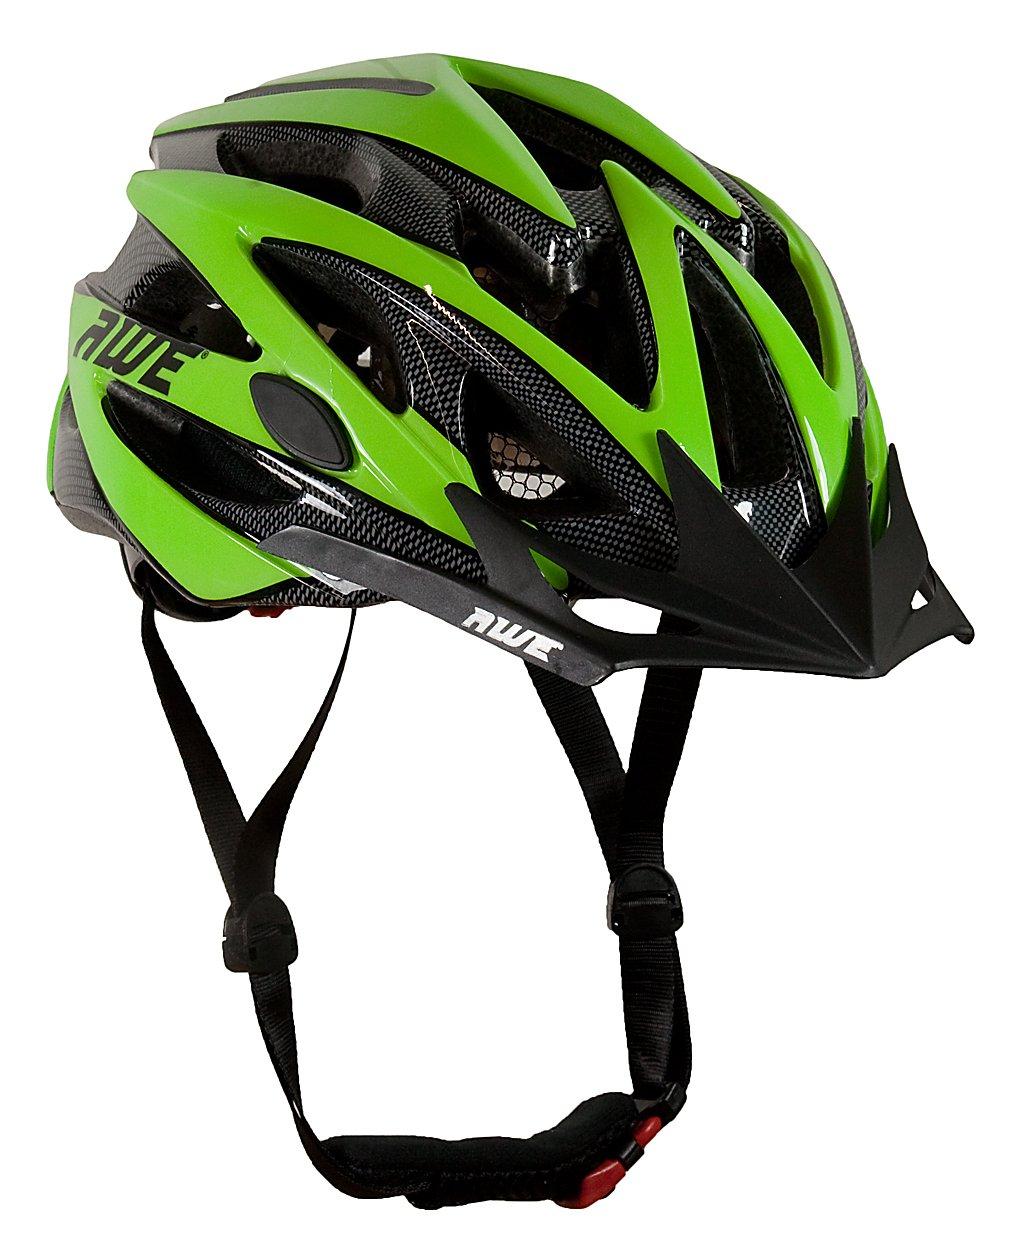 Casco para bicicleta sencillo, barato y multiuso